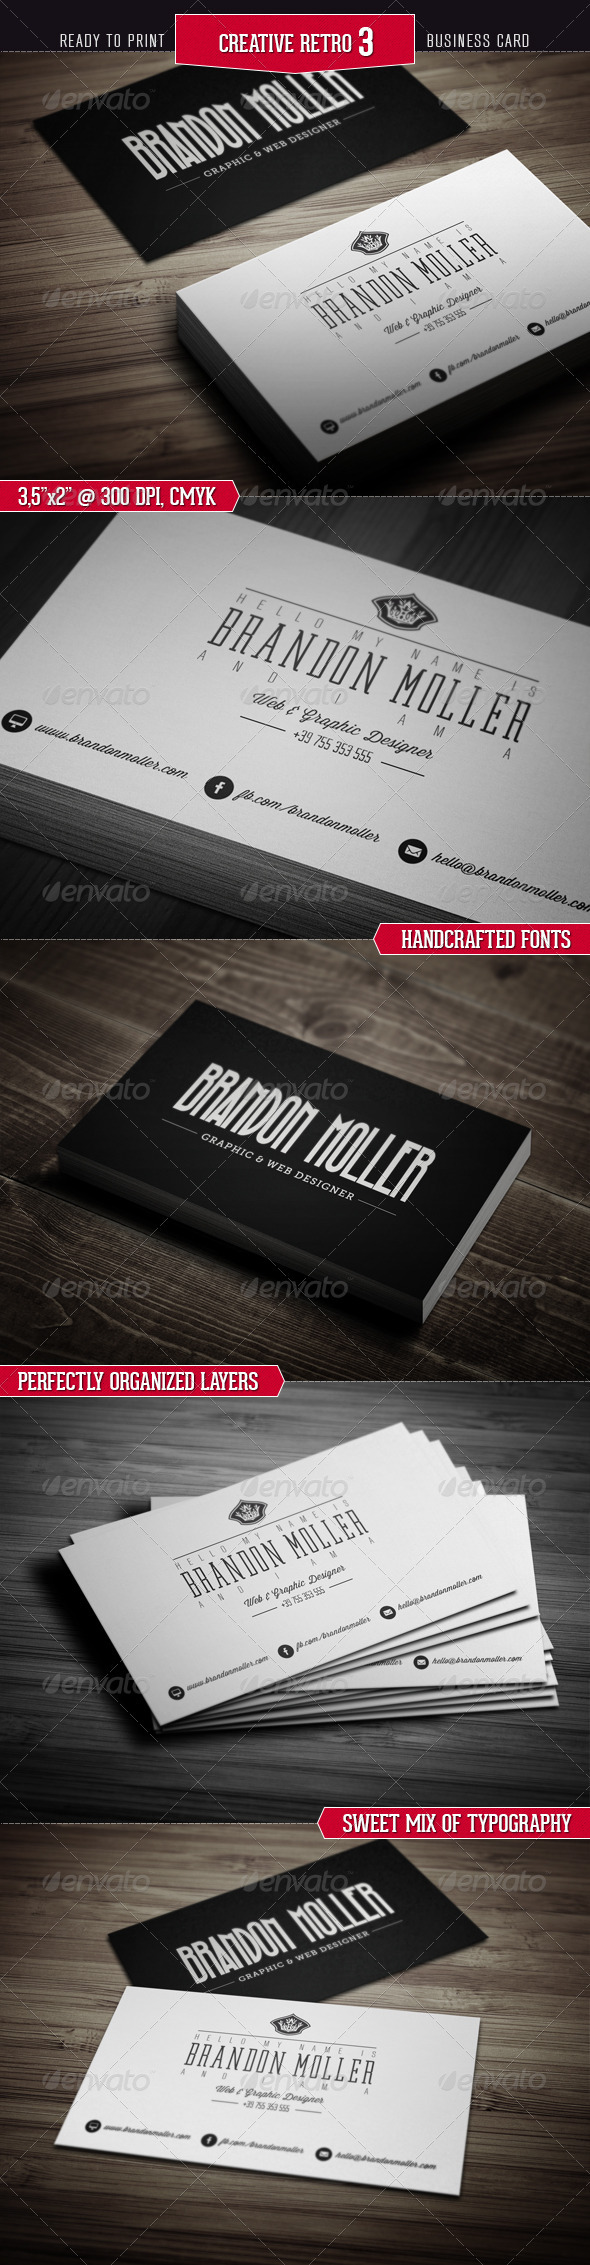 GraphicRiver Creative Retro Business Card 3 3186969